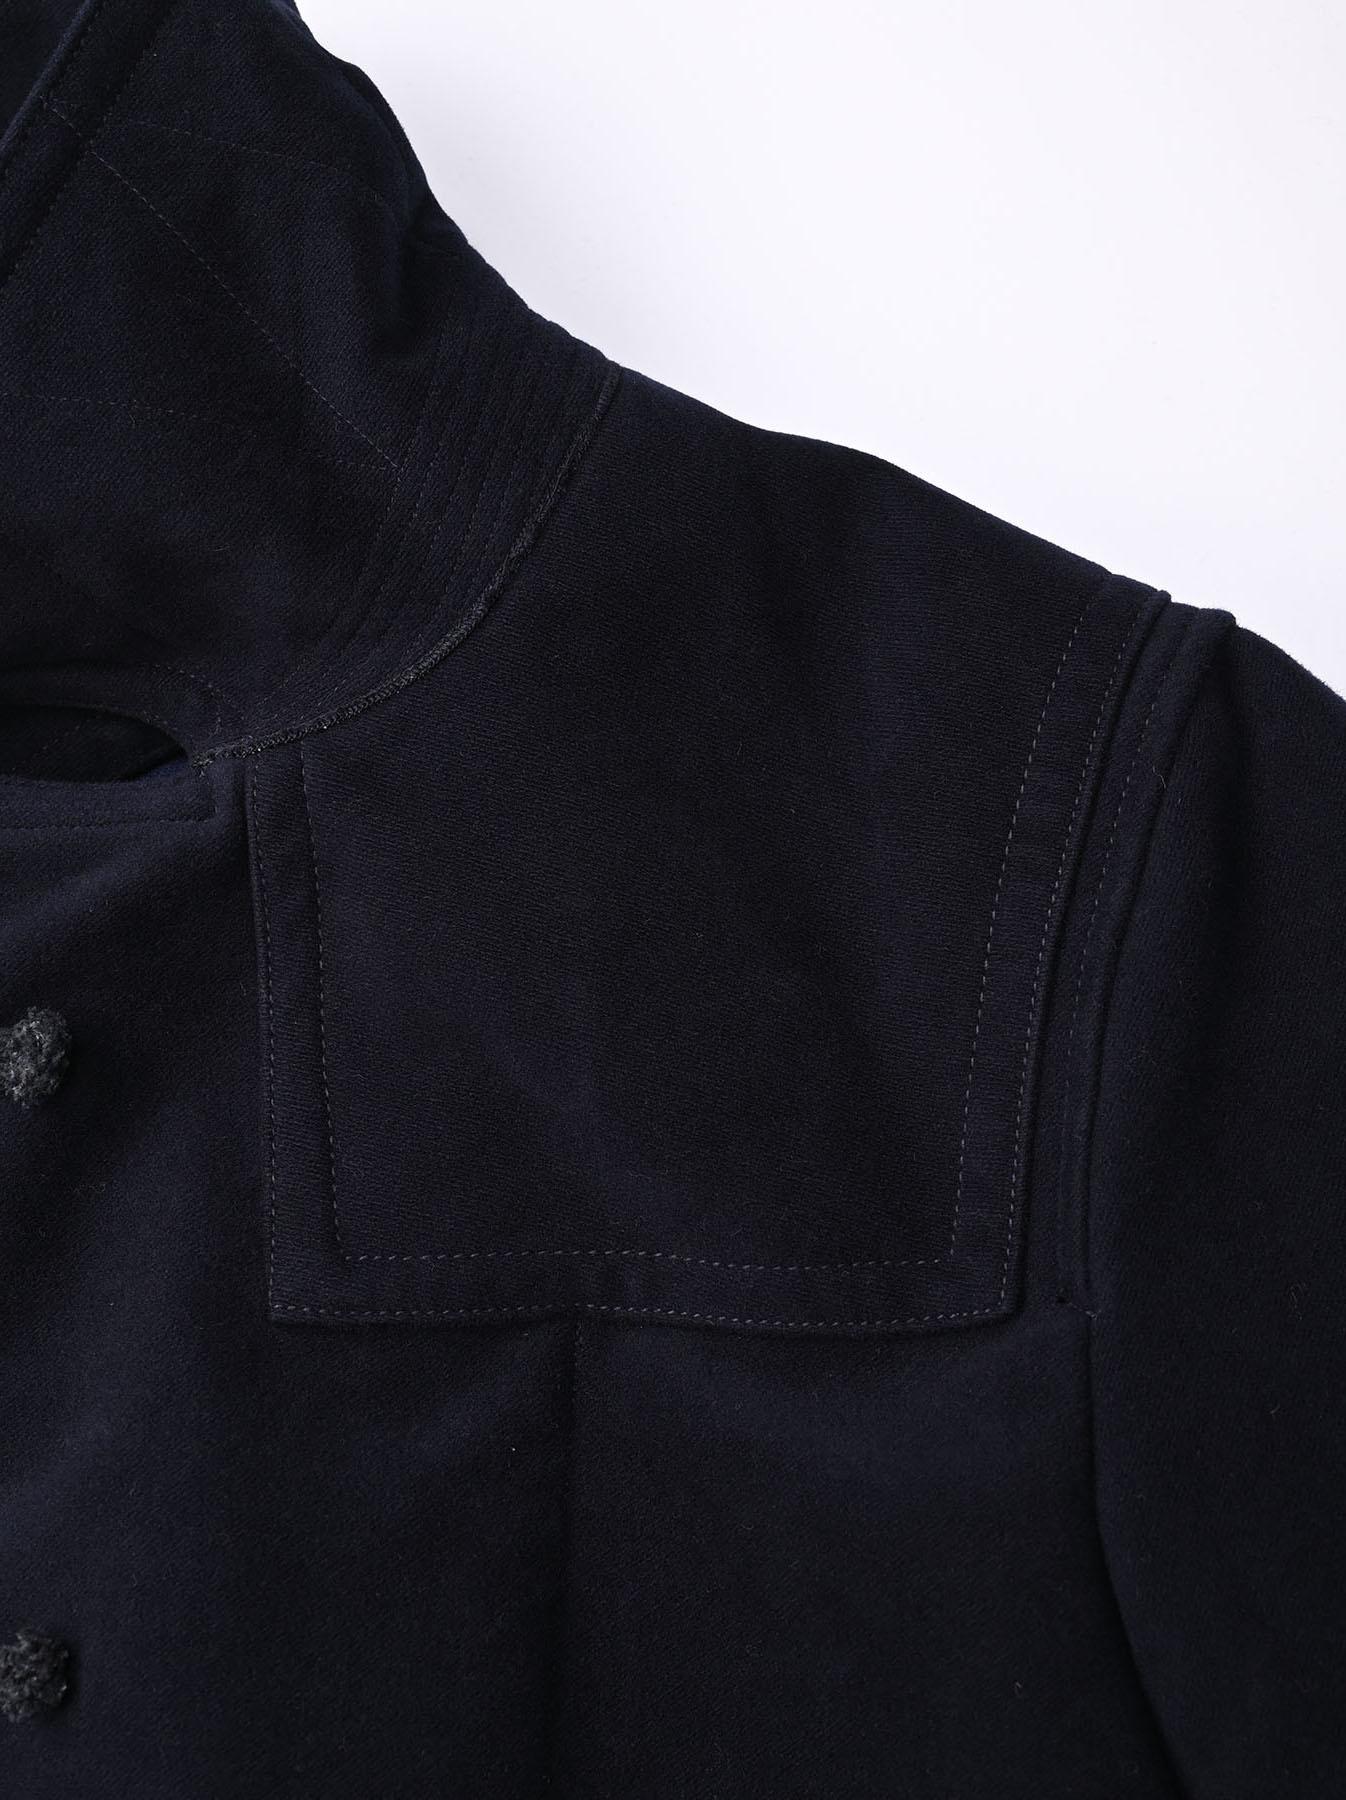 Thick Cotton Flannel Hayama Duffle Coat-7